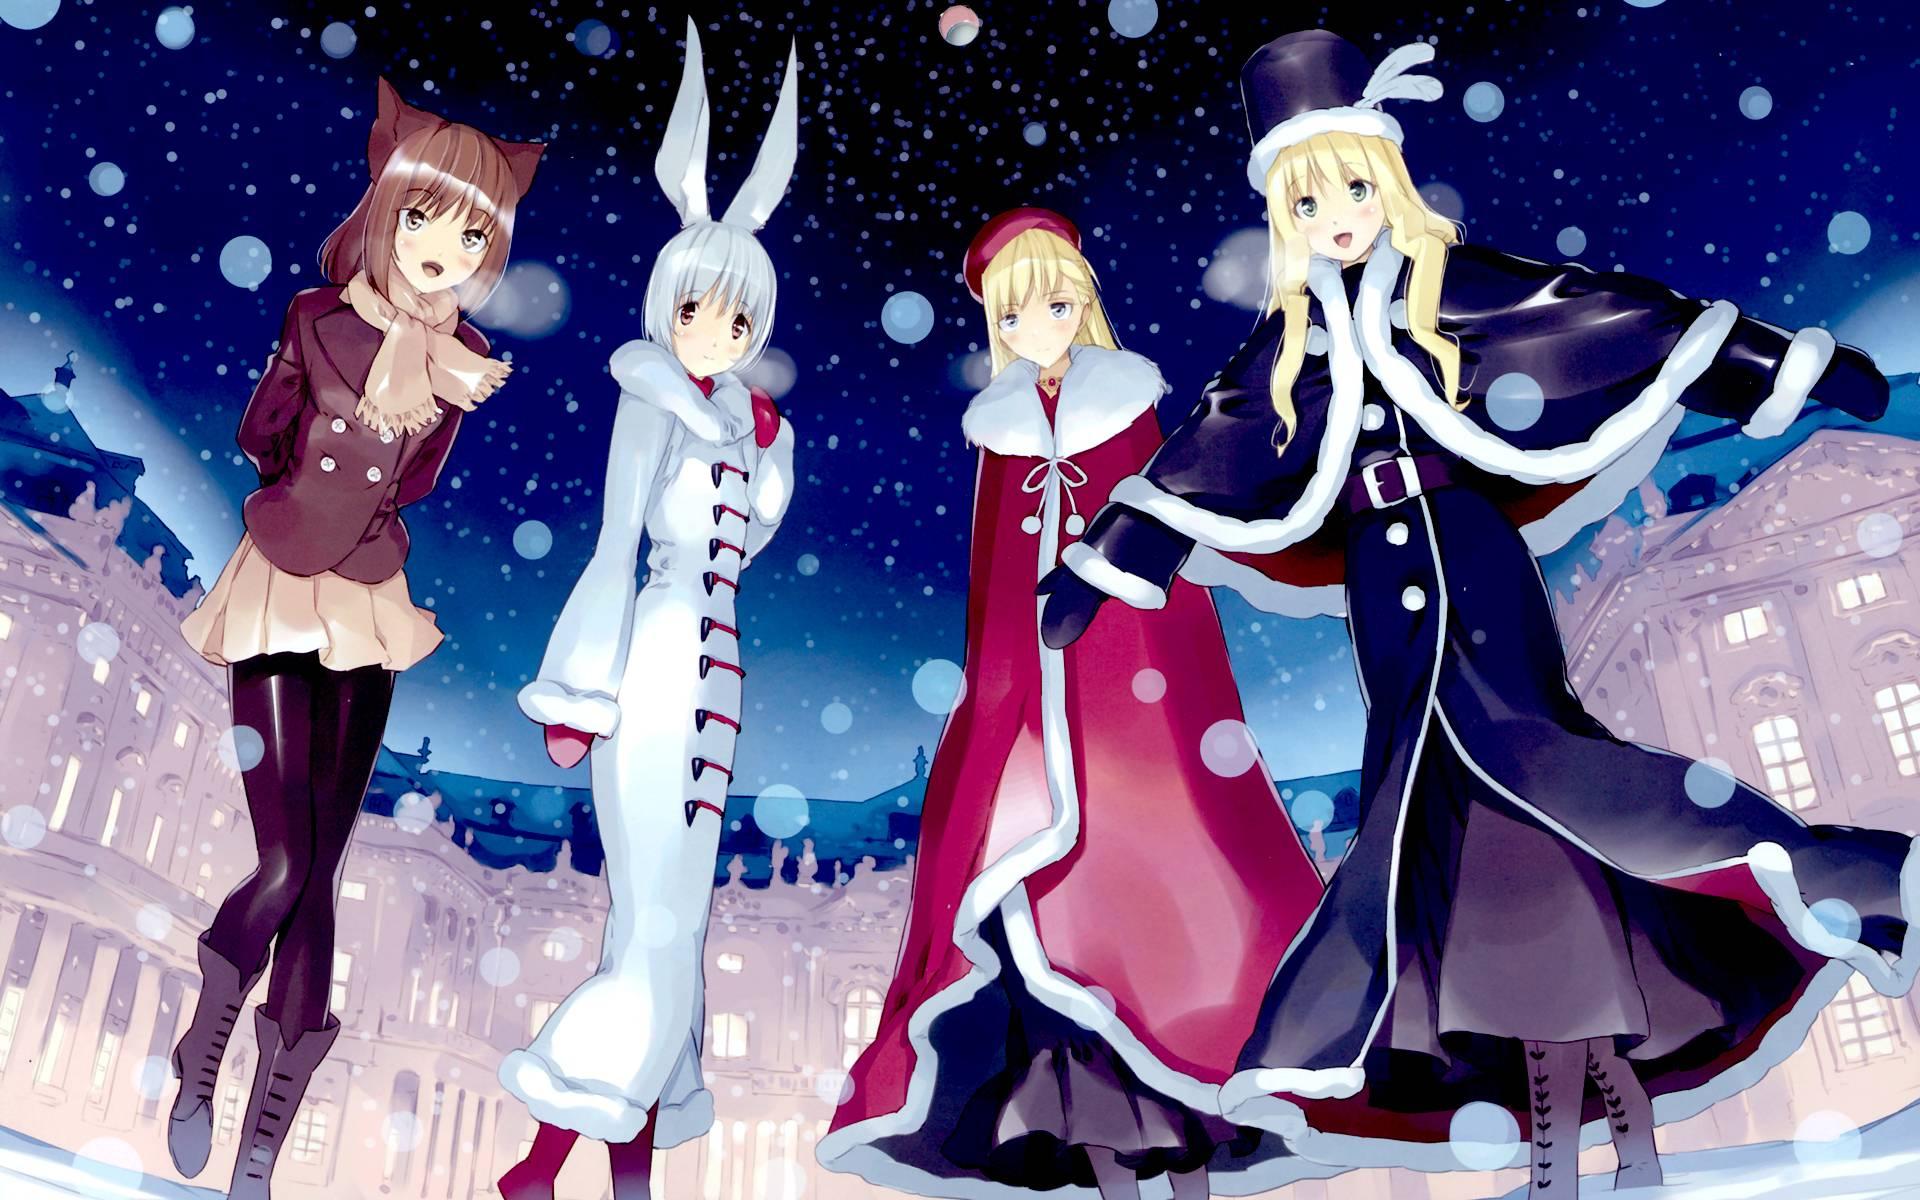 Anime Winter Girls Wallpaper 1920x1200